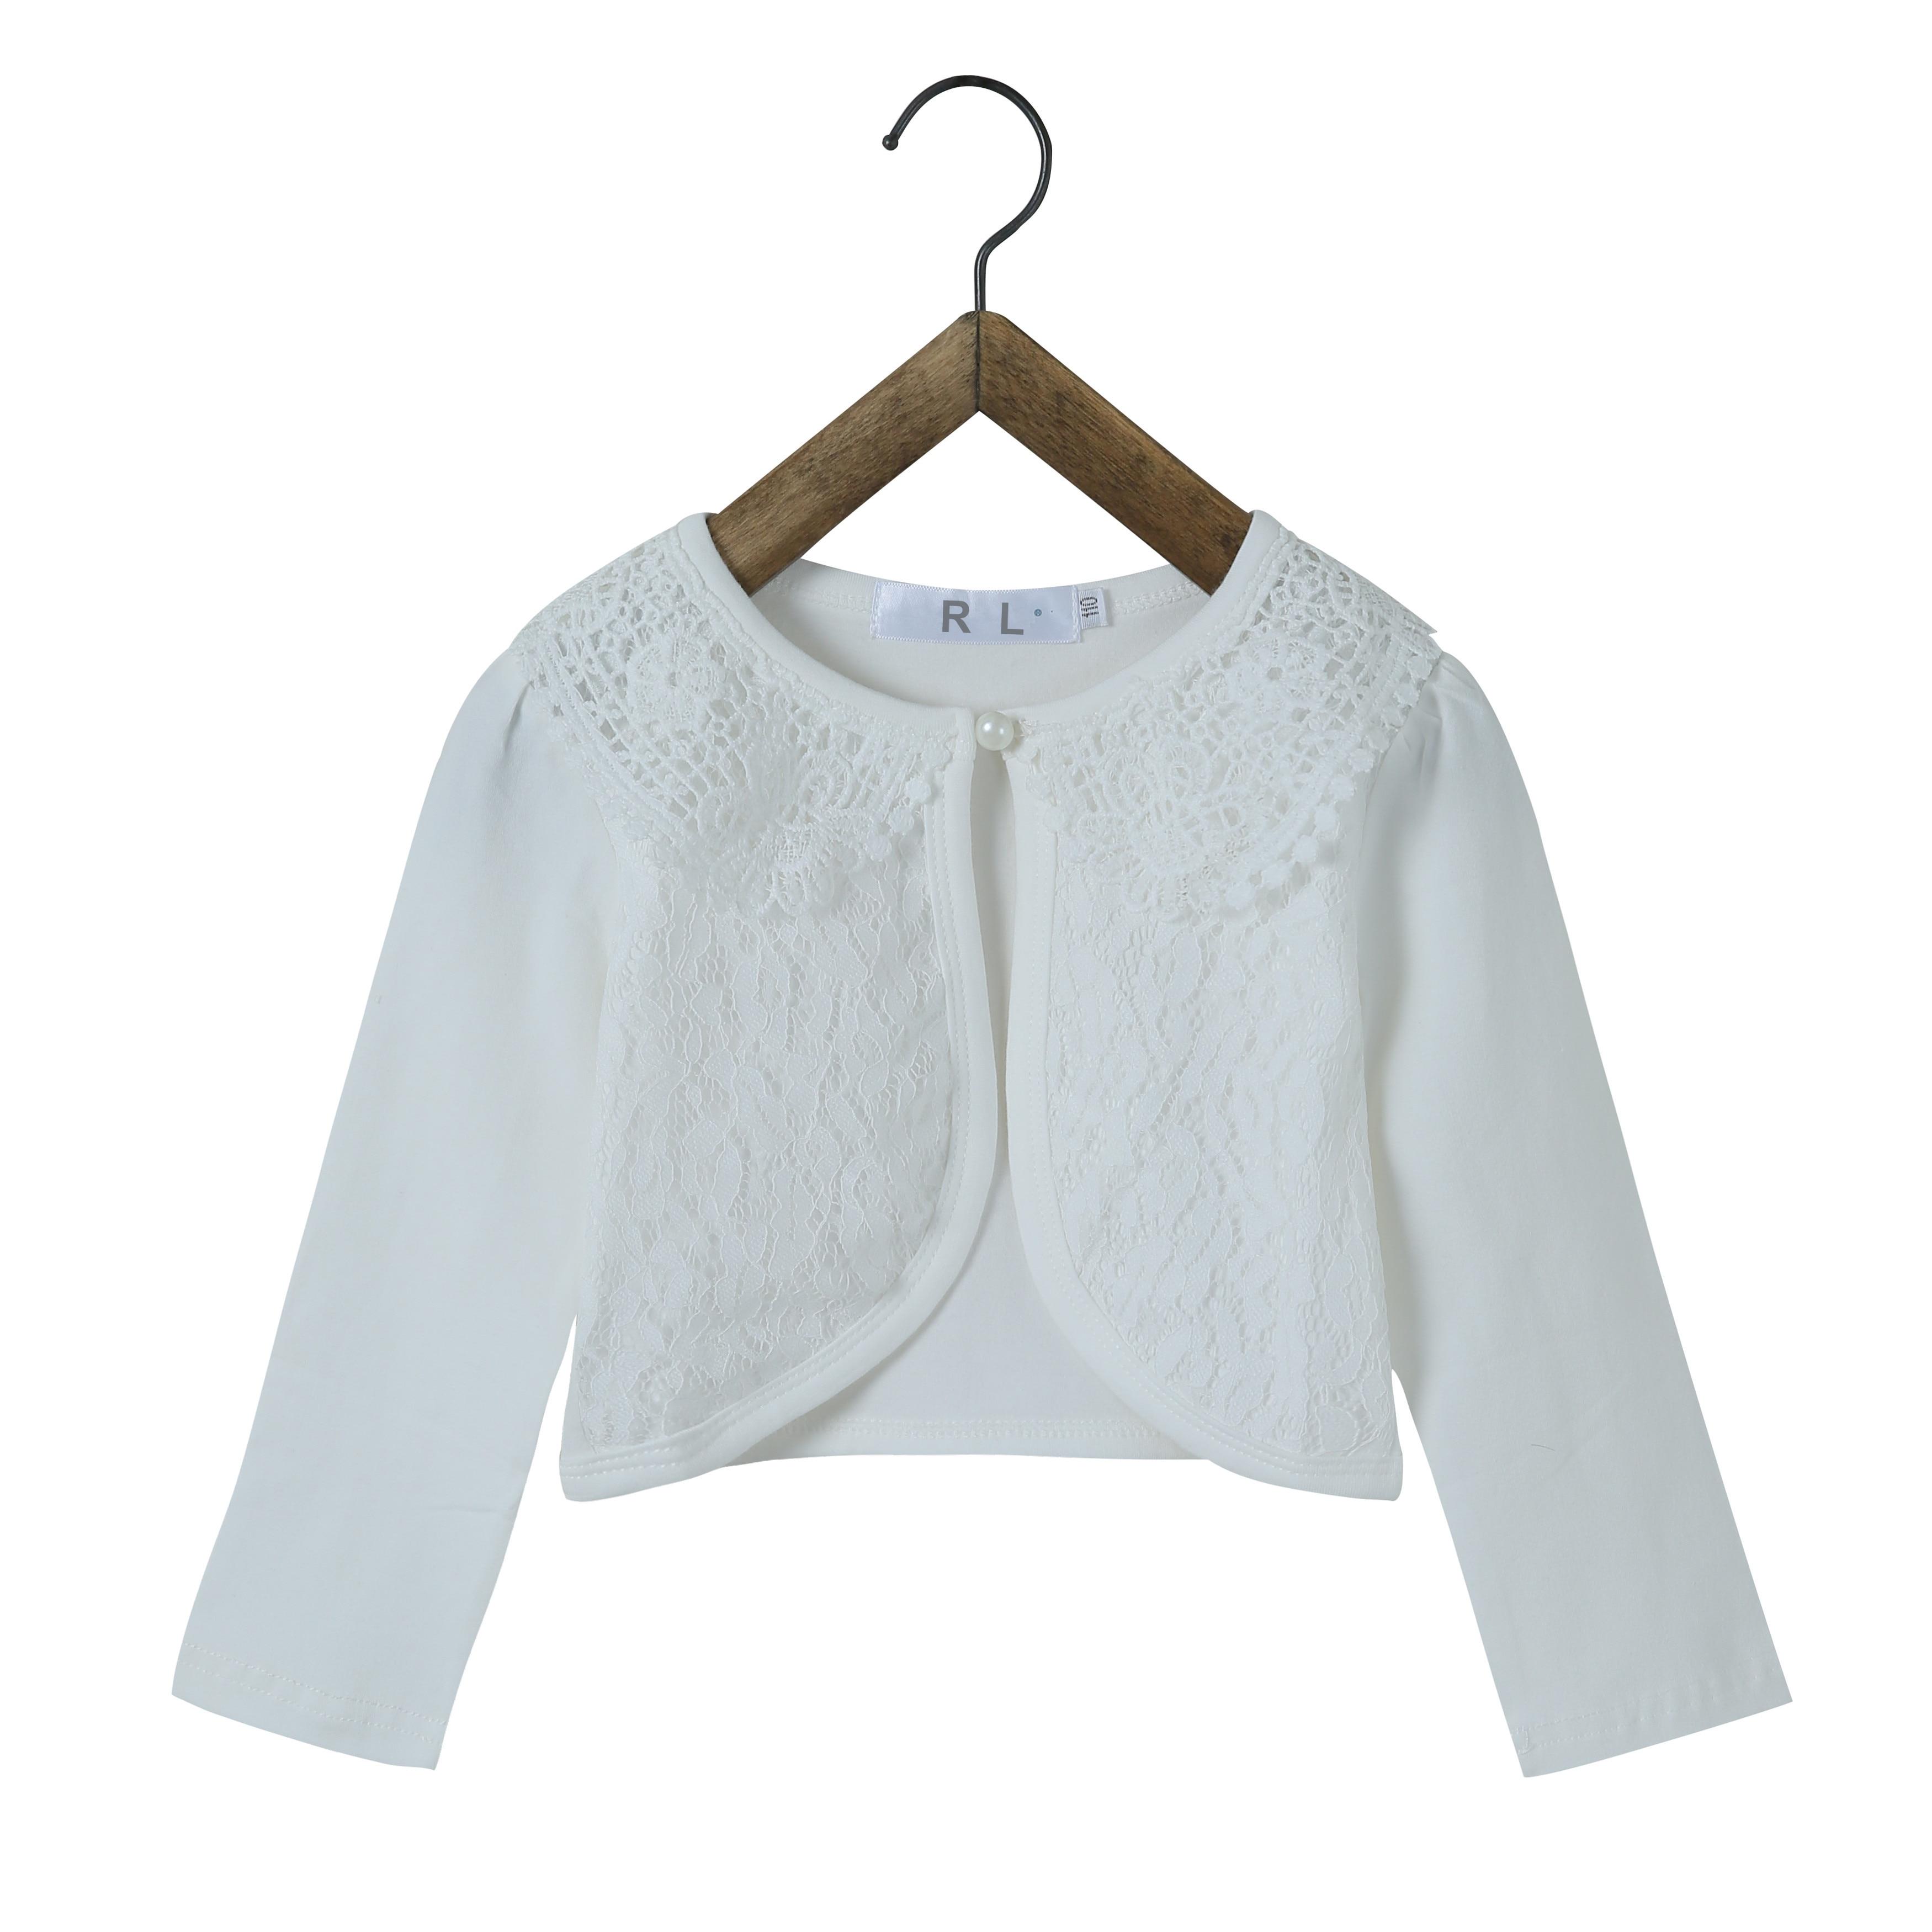 Girls Minx Silver Thread Long Sleeved Kids Fashion Top 7 8 9 10 11 12 13 Years